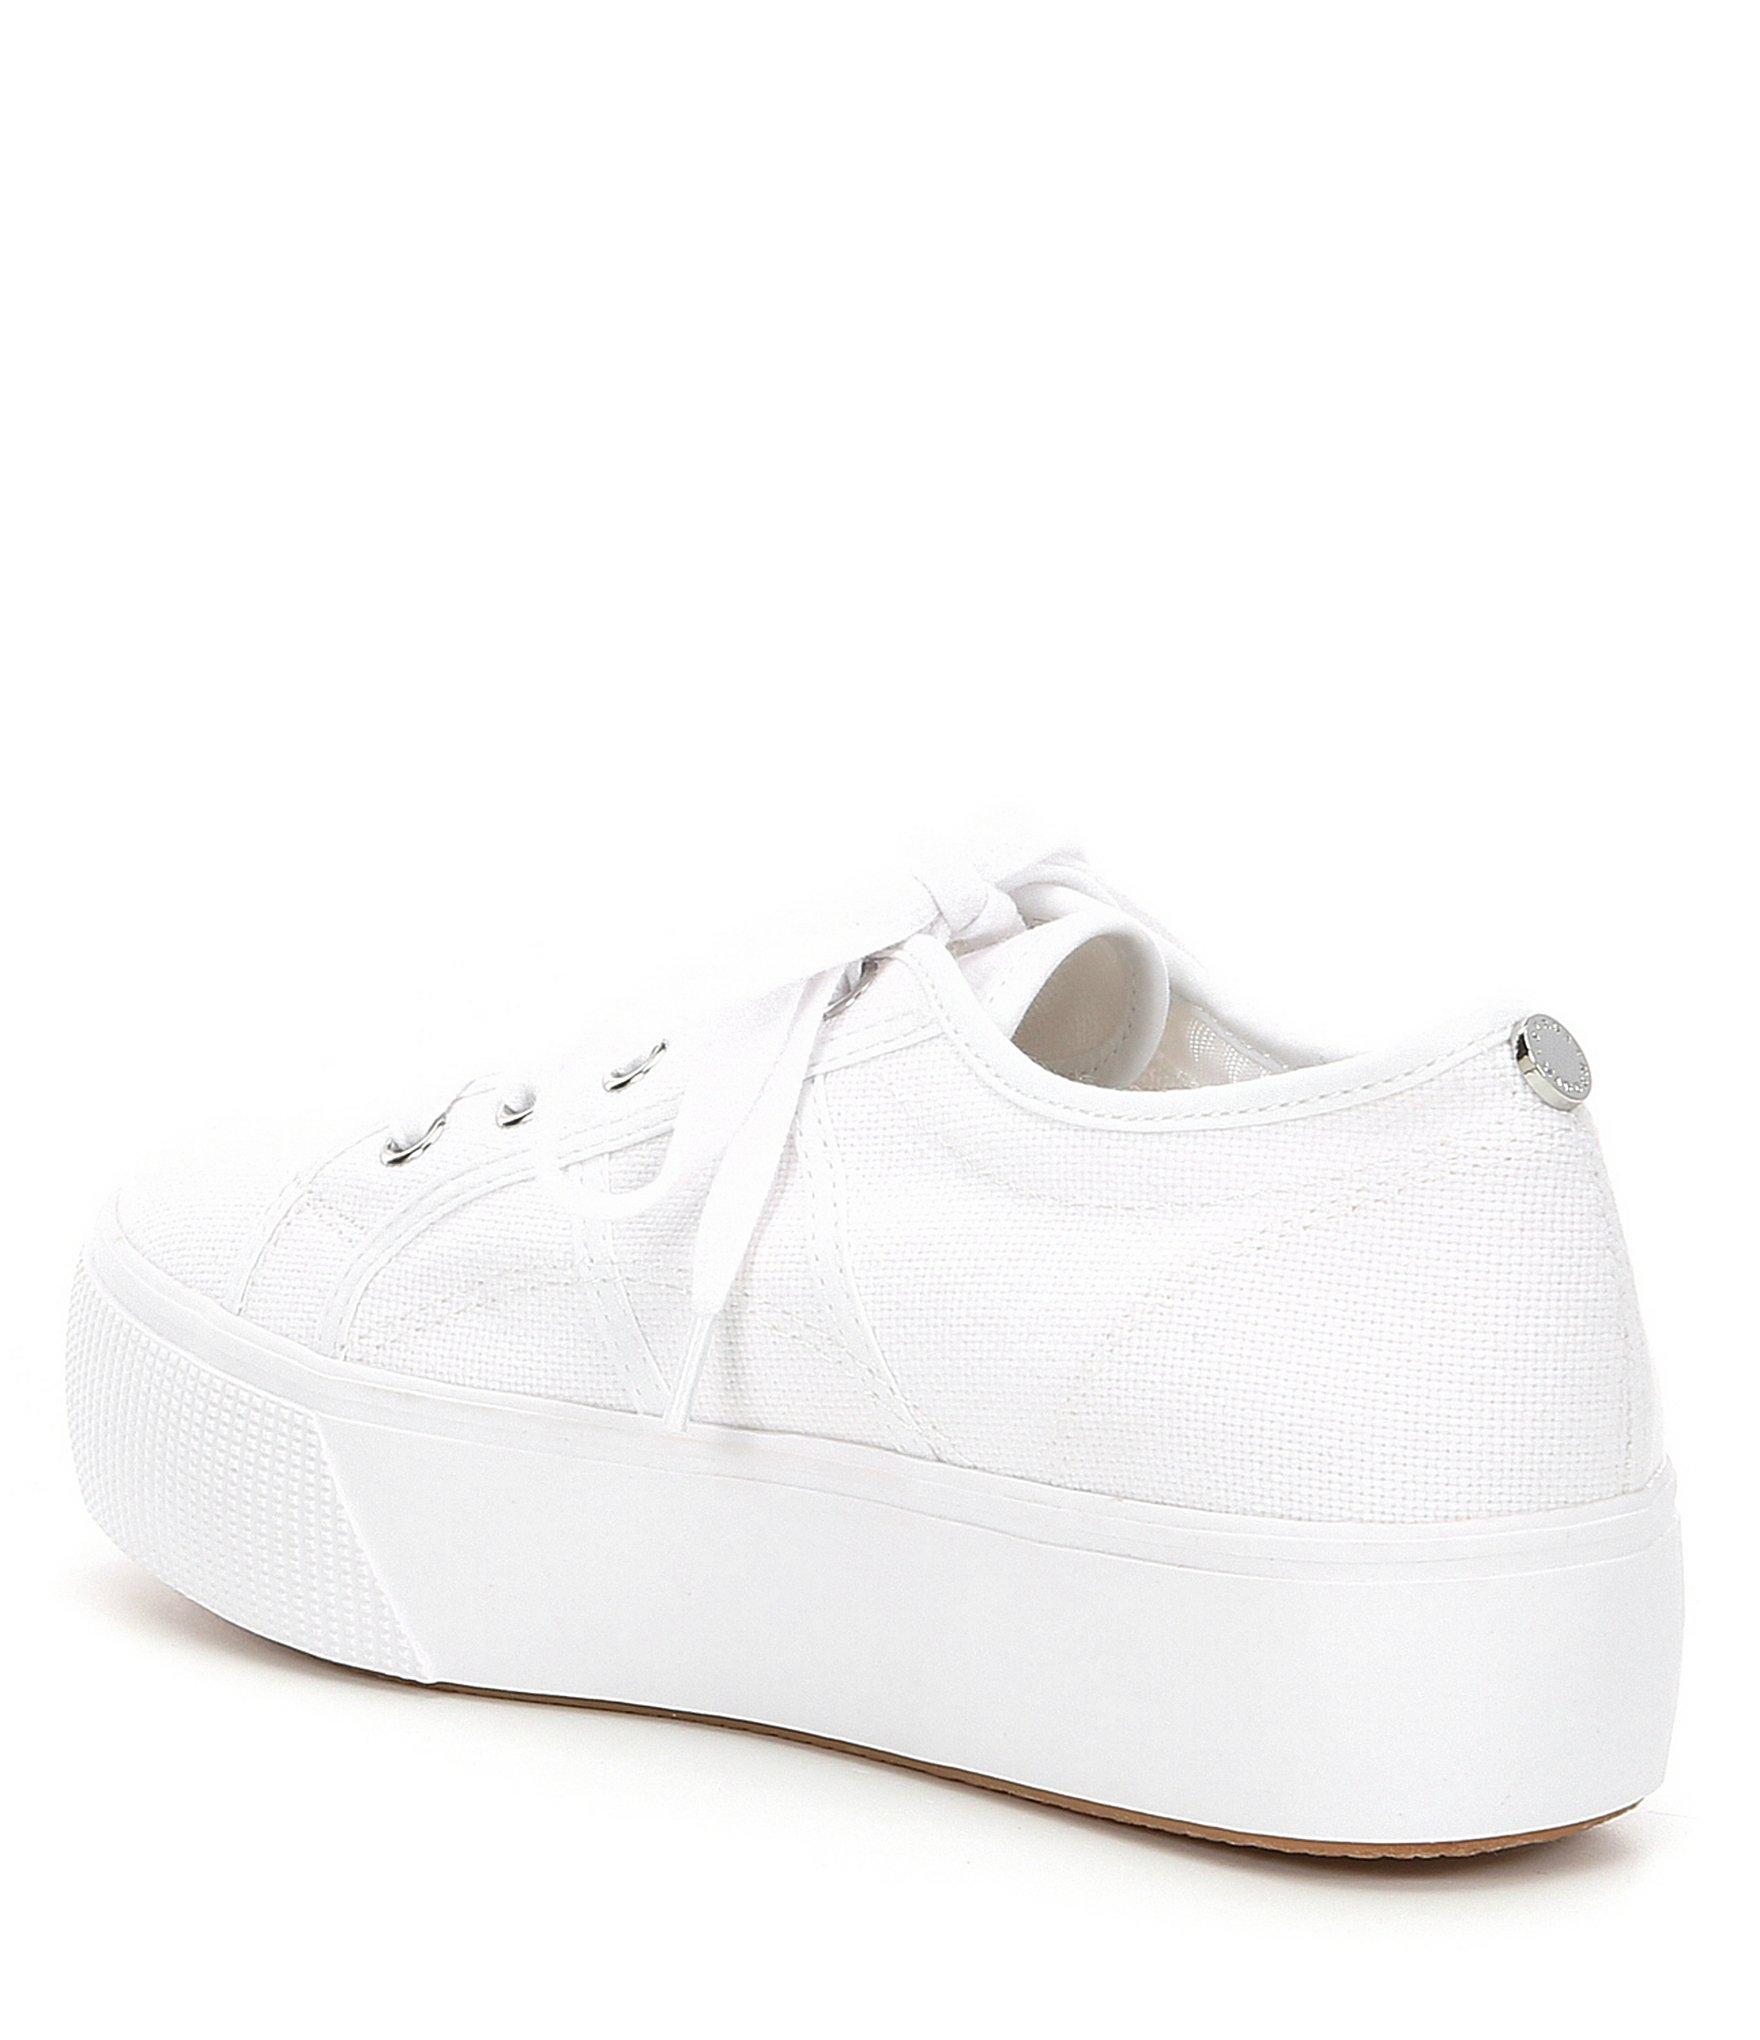 b7559a05ac3c Steve Madden - White Emmi Canvas Platform Sneakers - Lyst. View fullscreen